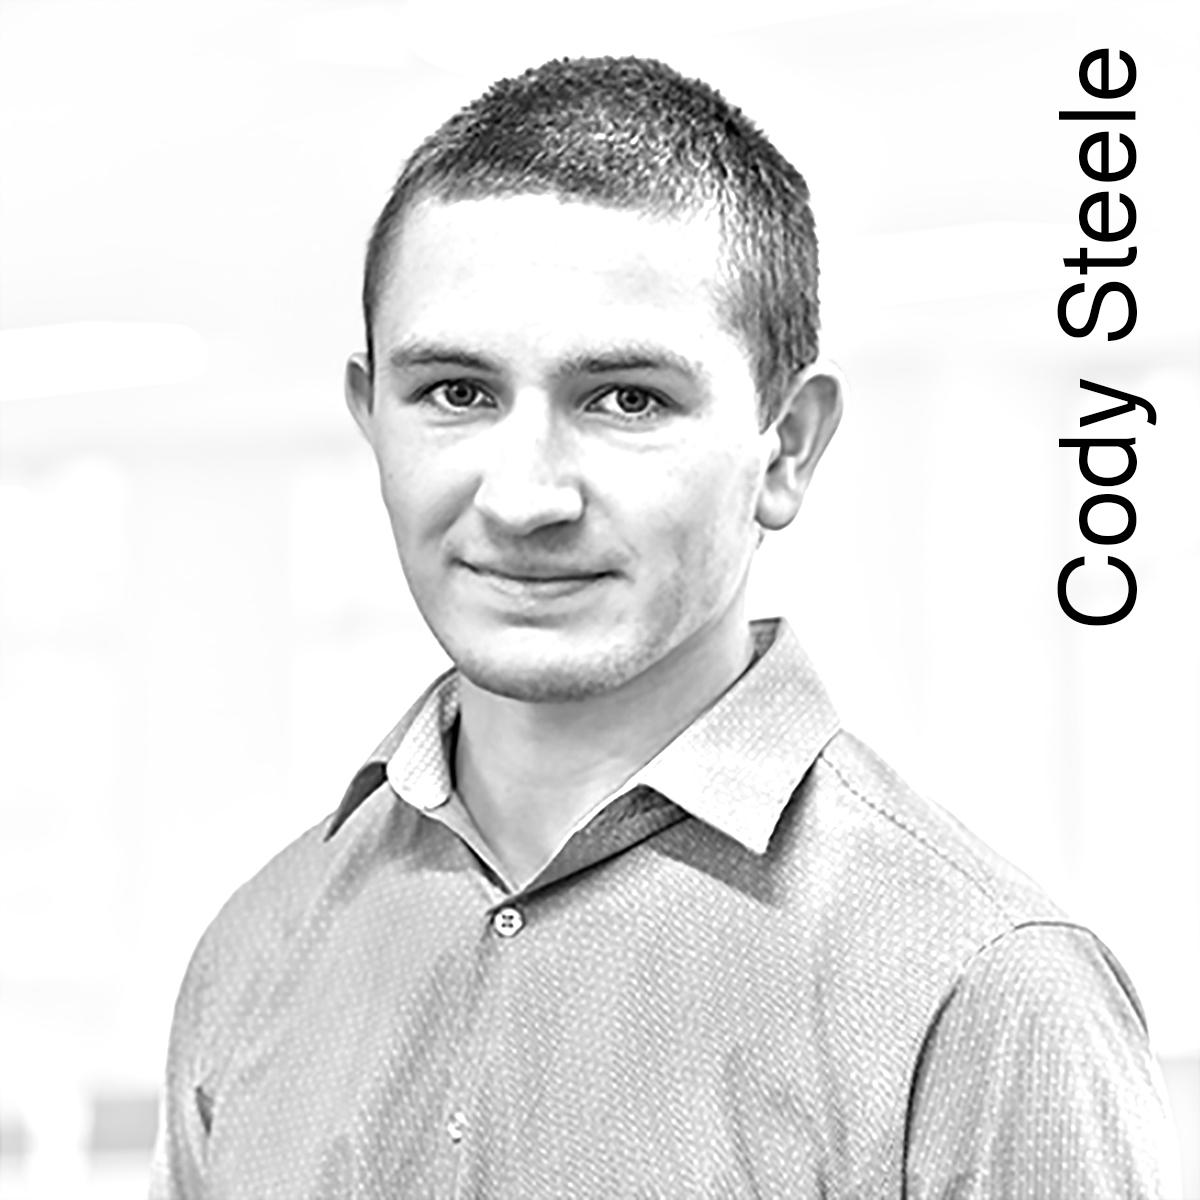 cody_steele_square_copy1.jpg